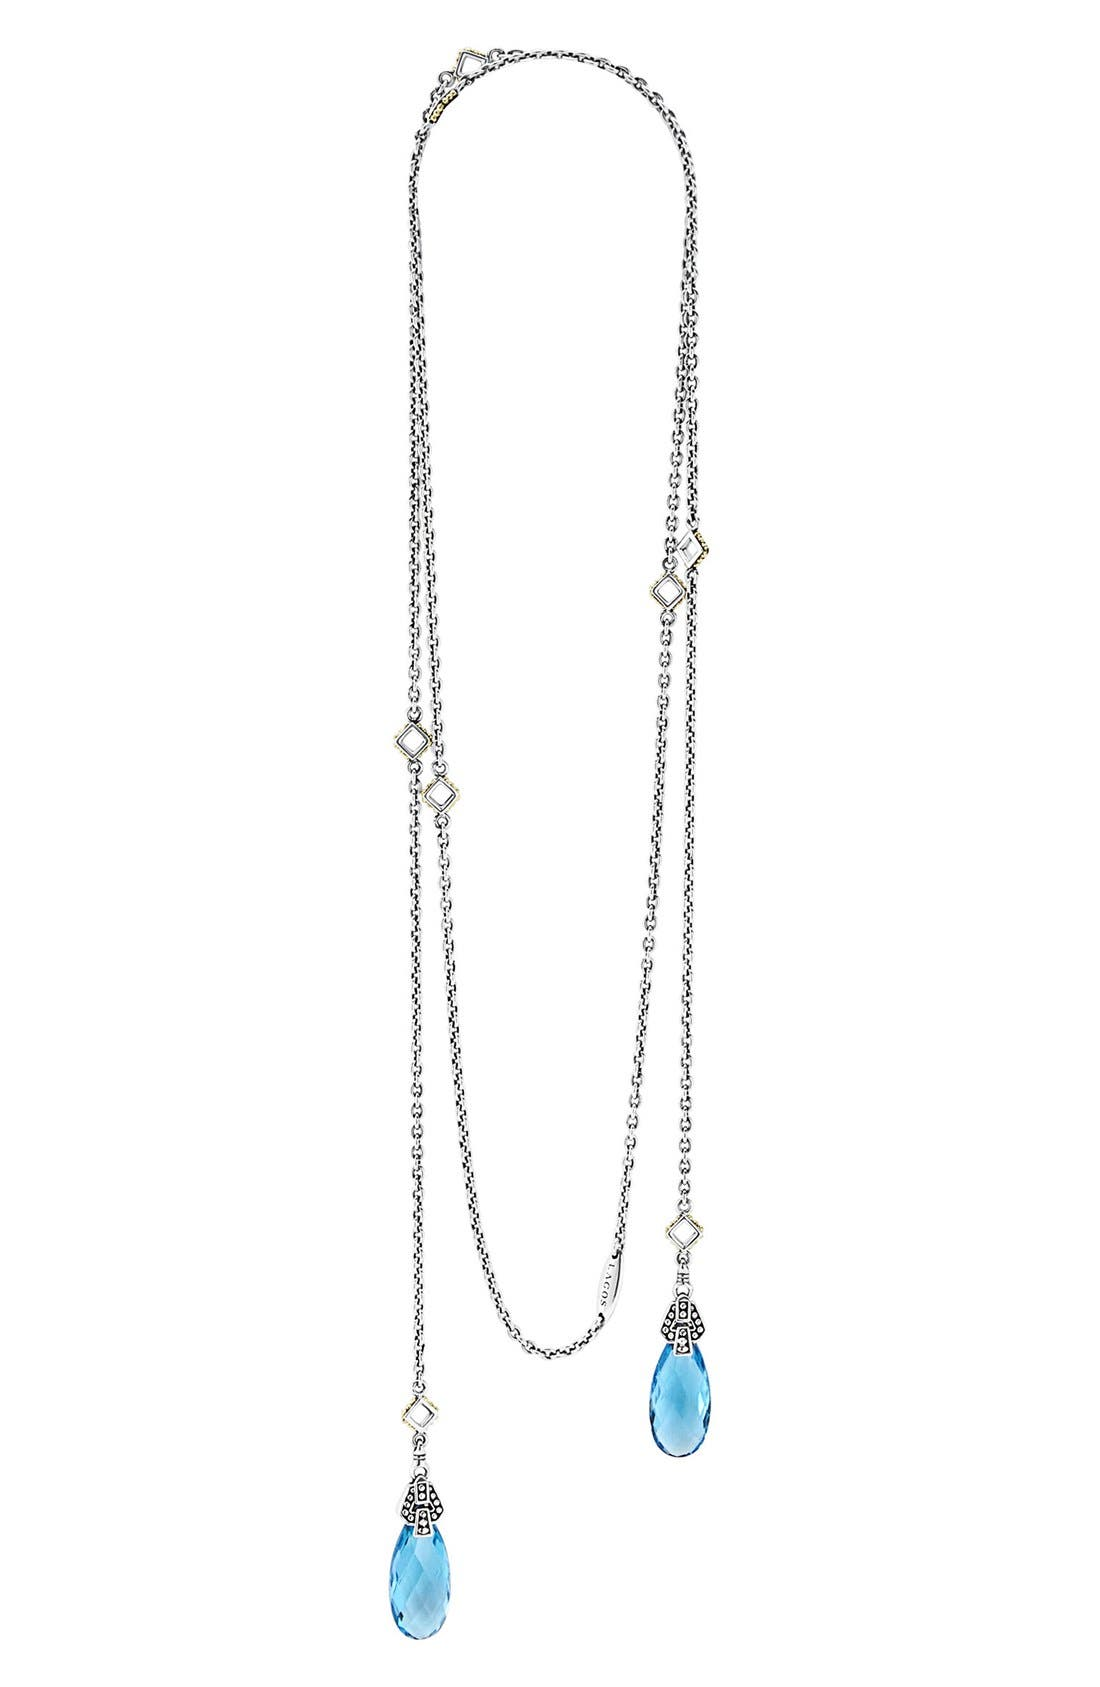 Main Image - LAGOS 'Caviar Color' Semiprecious Stone Lariat Necklace